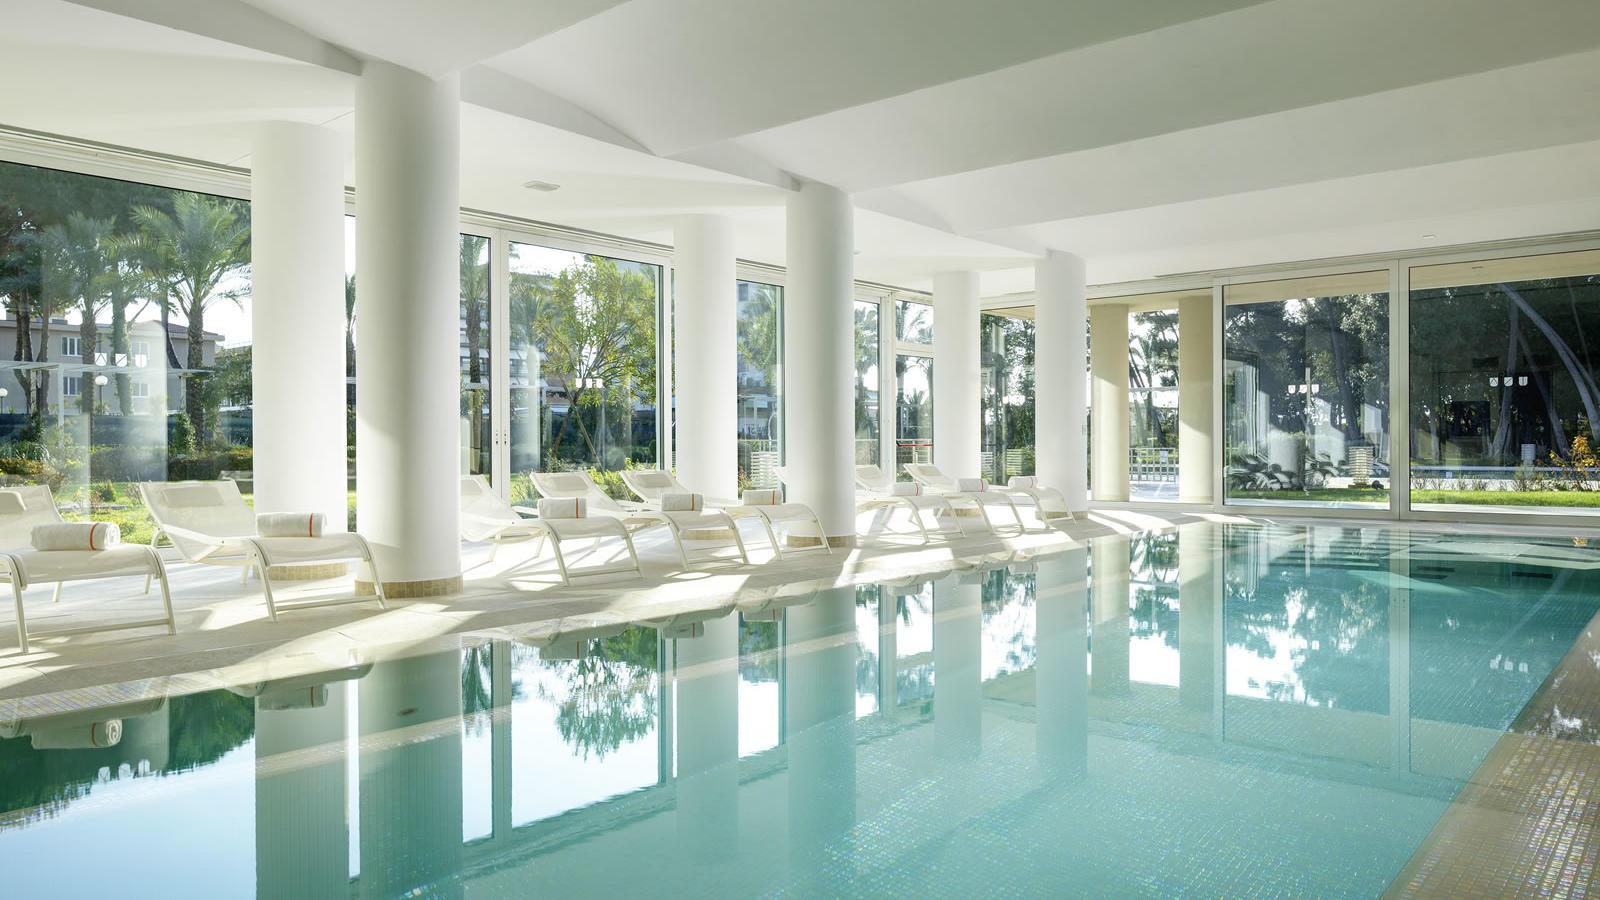 Wellness Hotel Versilia Lido Una Esperienze